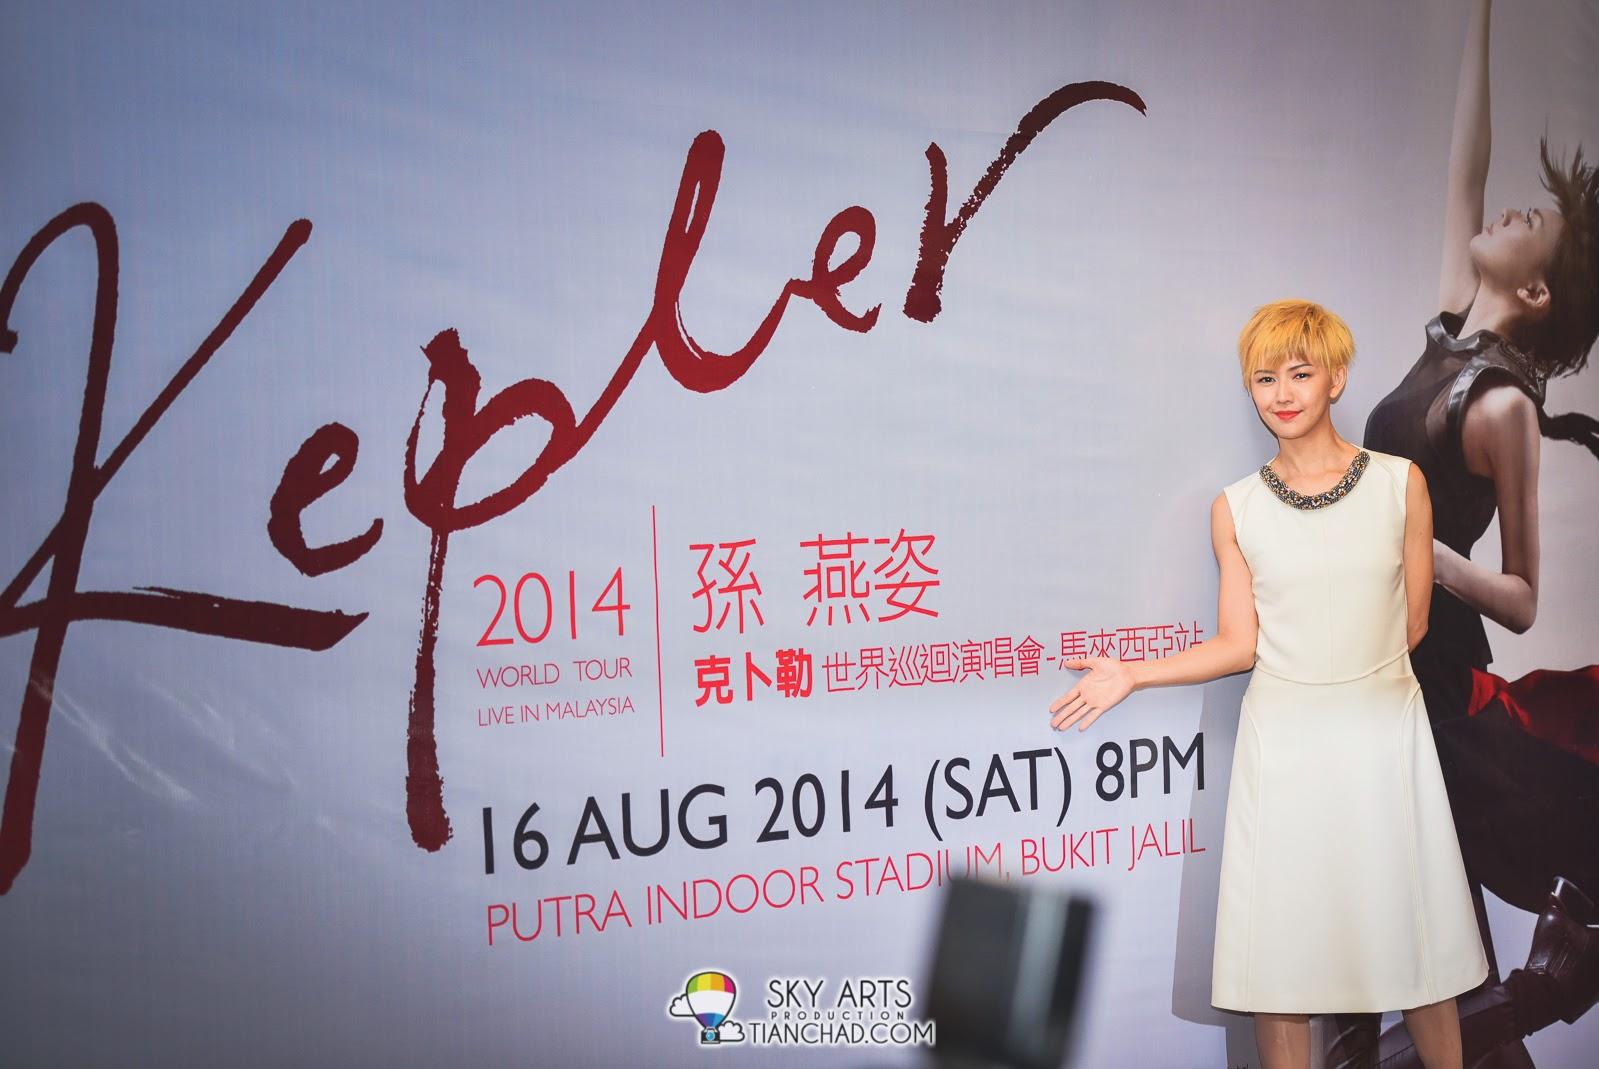 Stefanie Sun Kepler Live in Malaysia 2014 《孙燕姿2014克卜勒世界巡回演唱会》- 马来西亚站